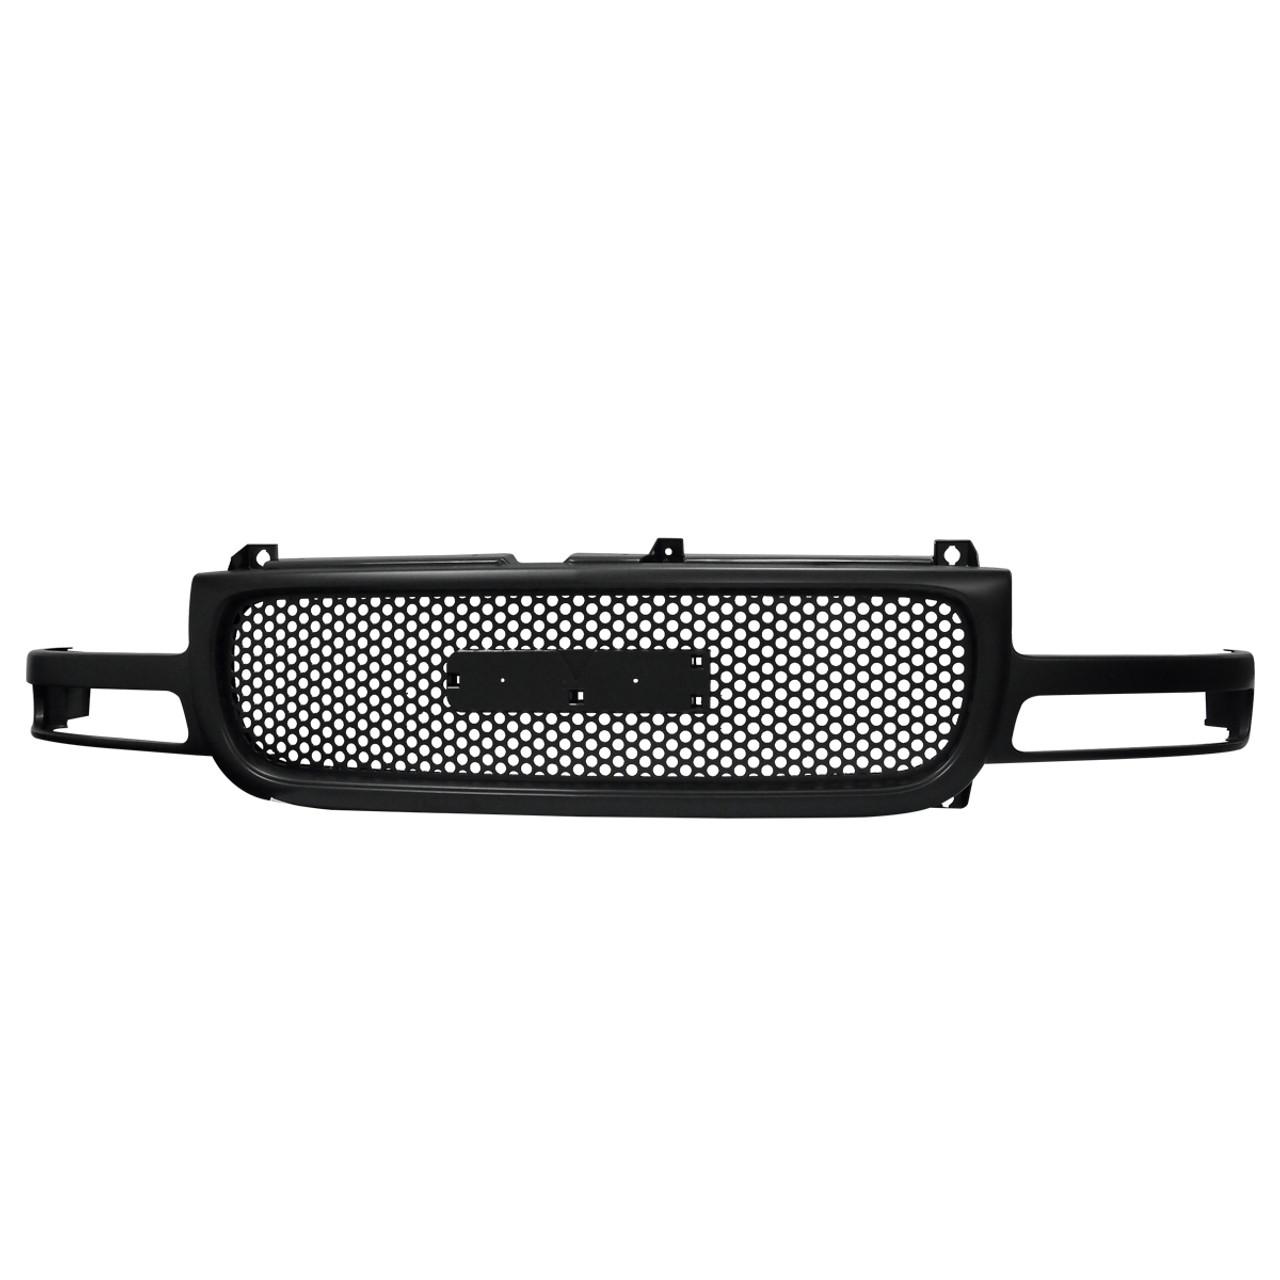 1999 2002 gmc sierra front mesh grille black spec d tuning 1999 2002 gmc sierra front mesh grille